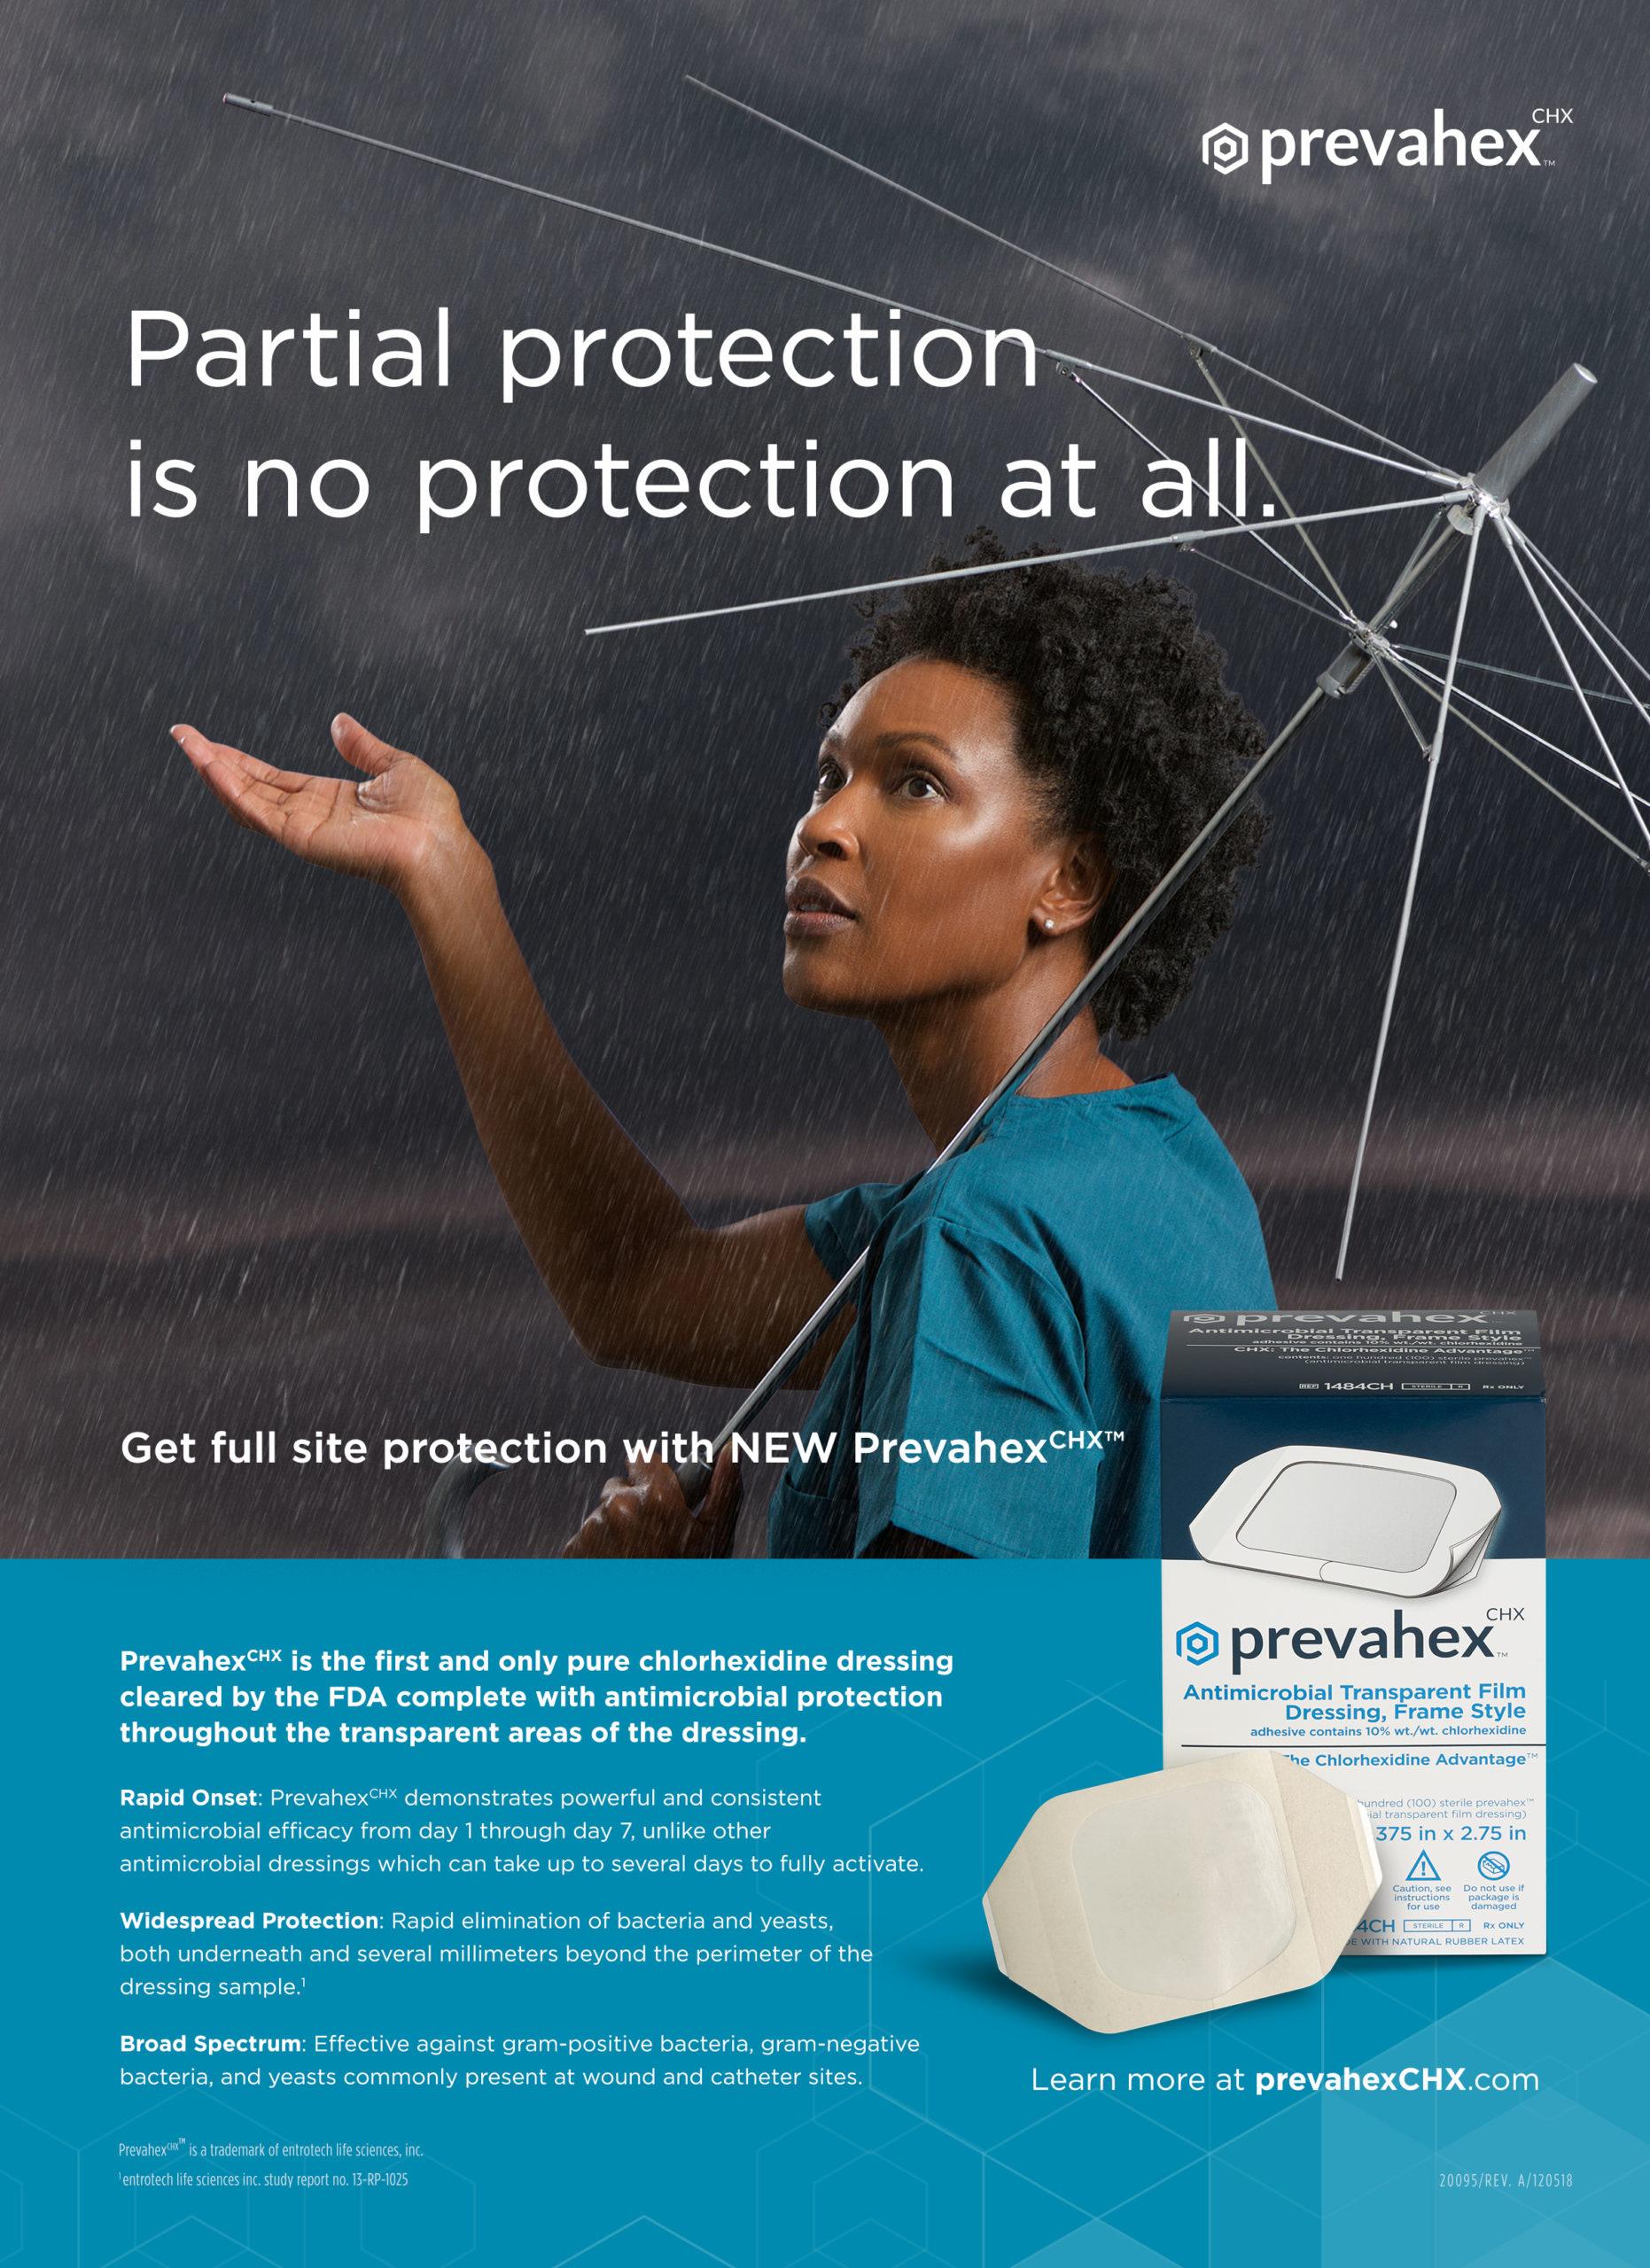 Prevahex ad